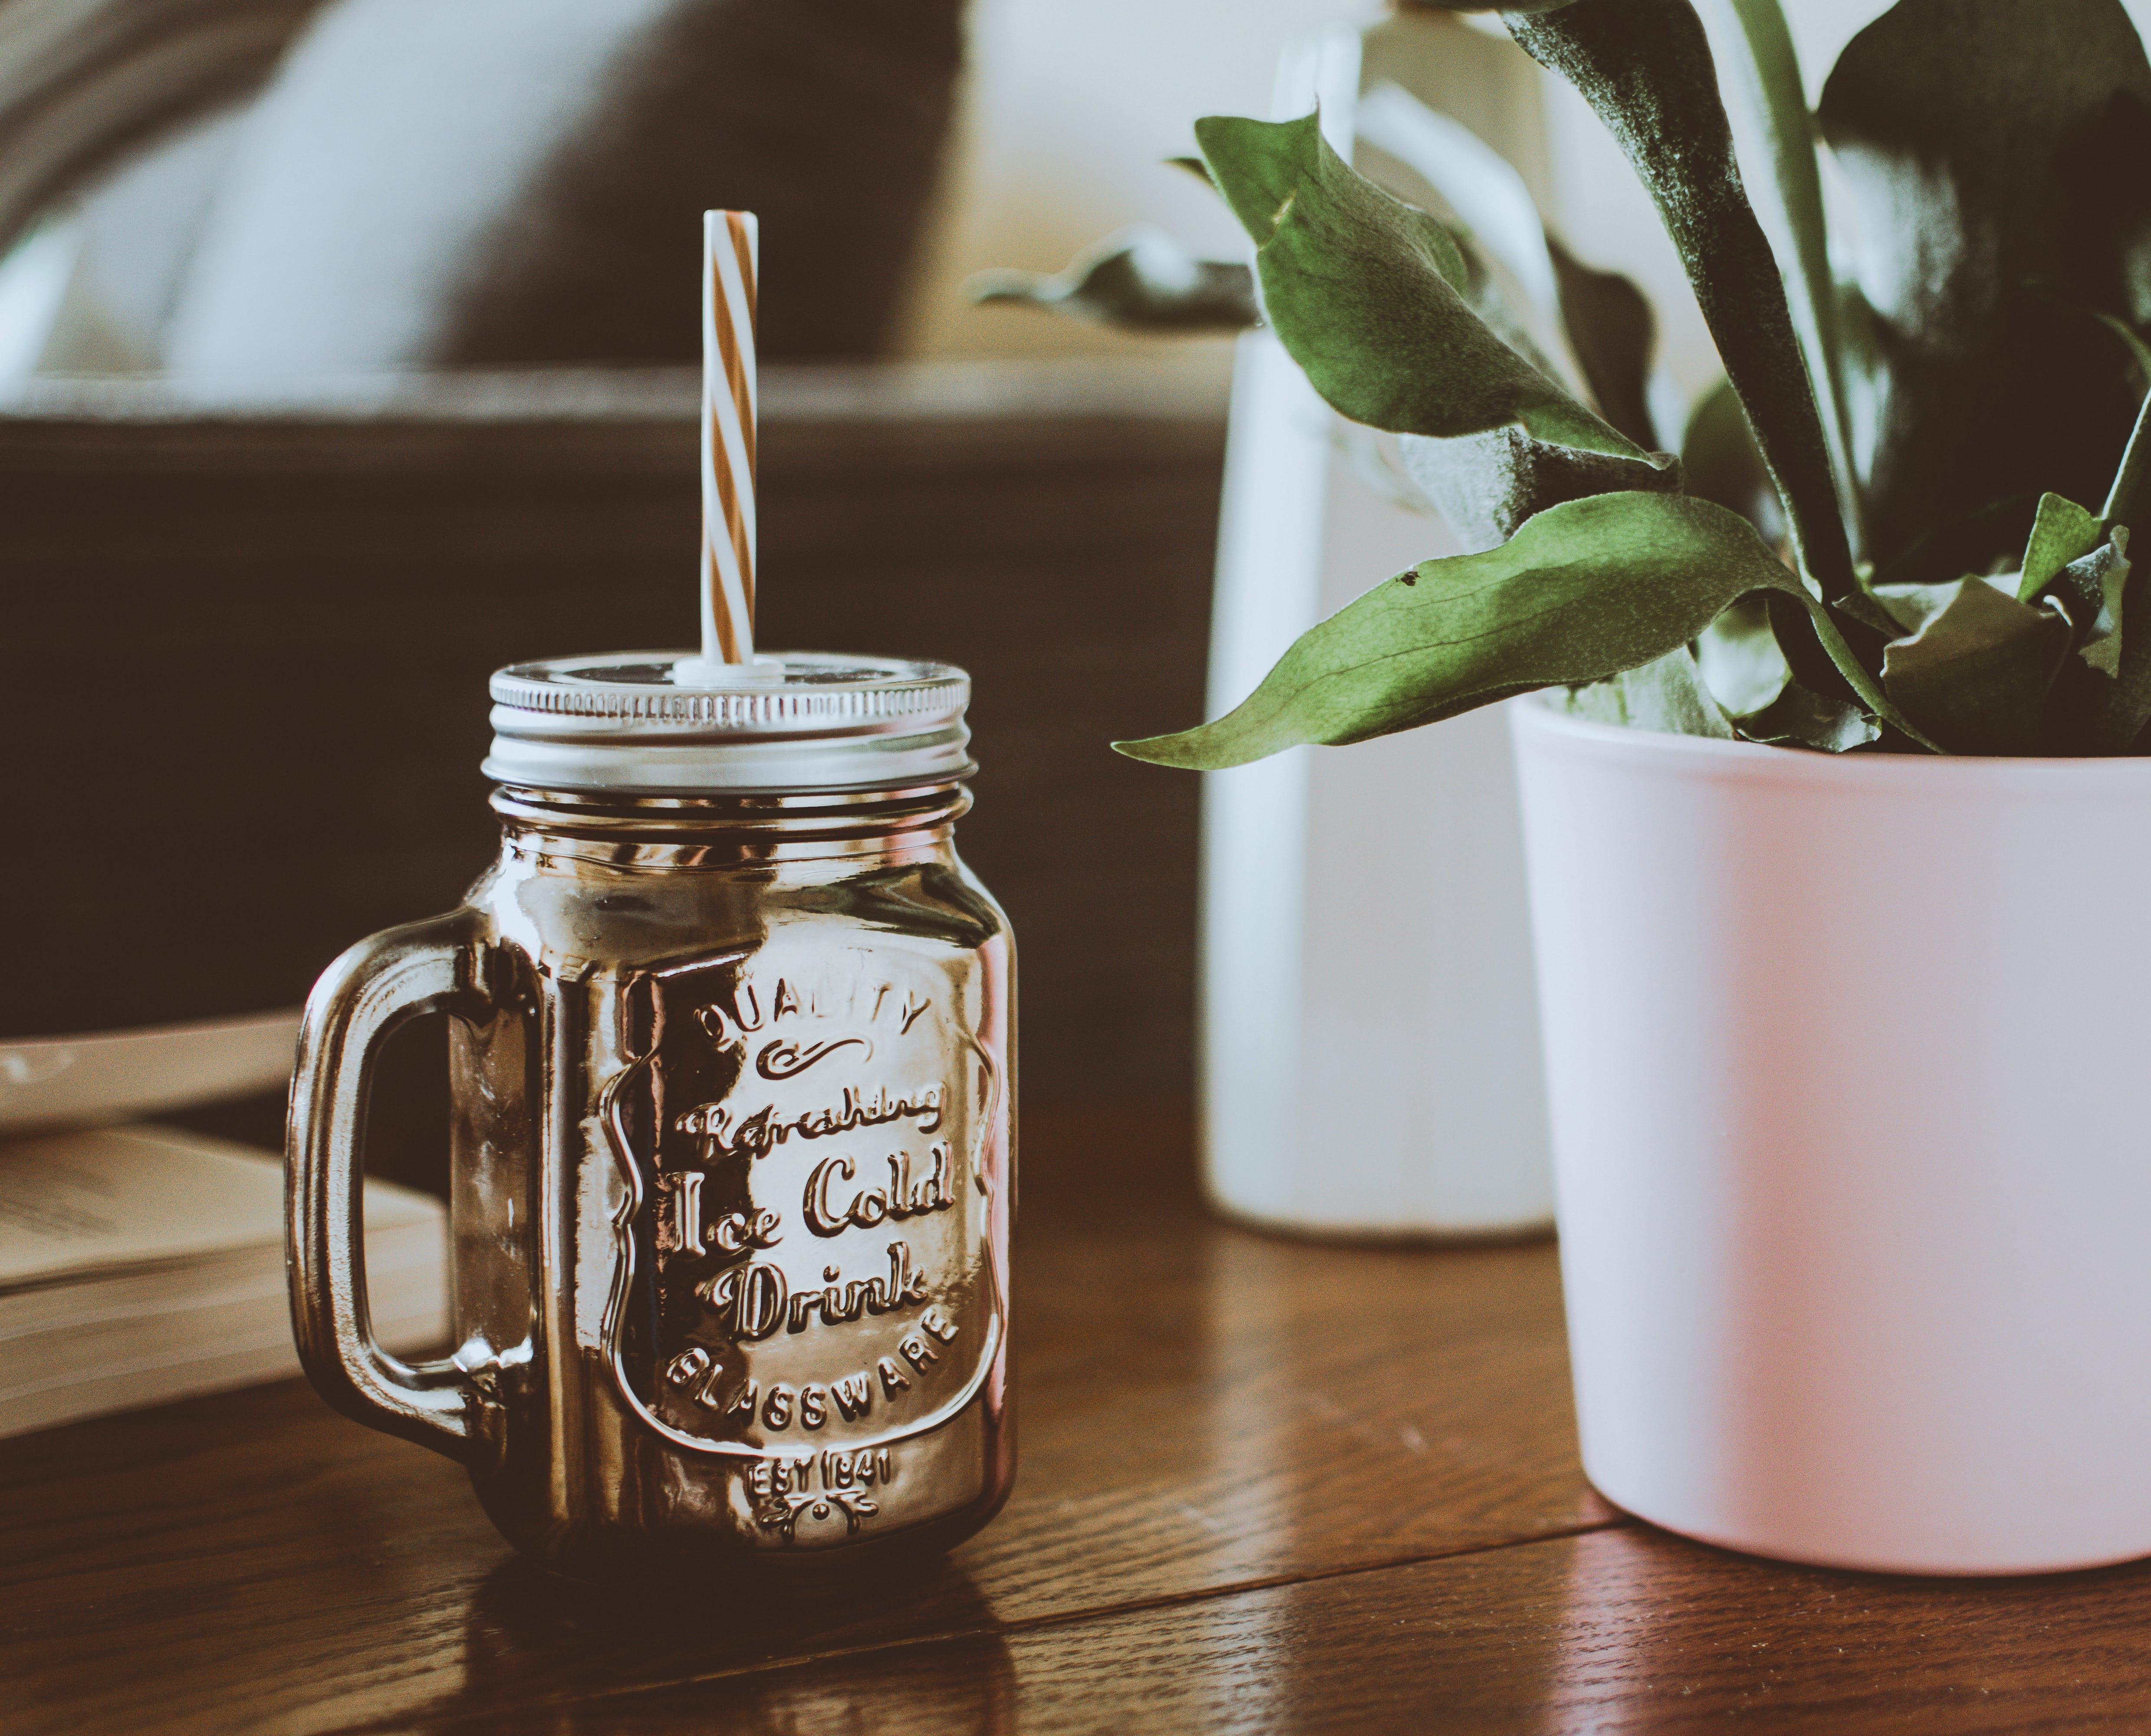 Brown Mason Jar Mug With Straw Beside Plant on Table